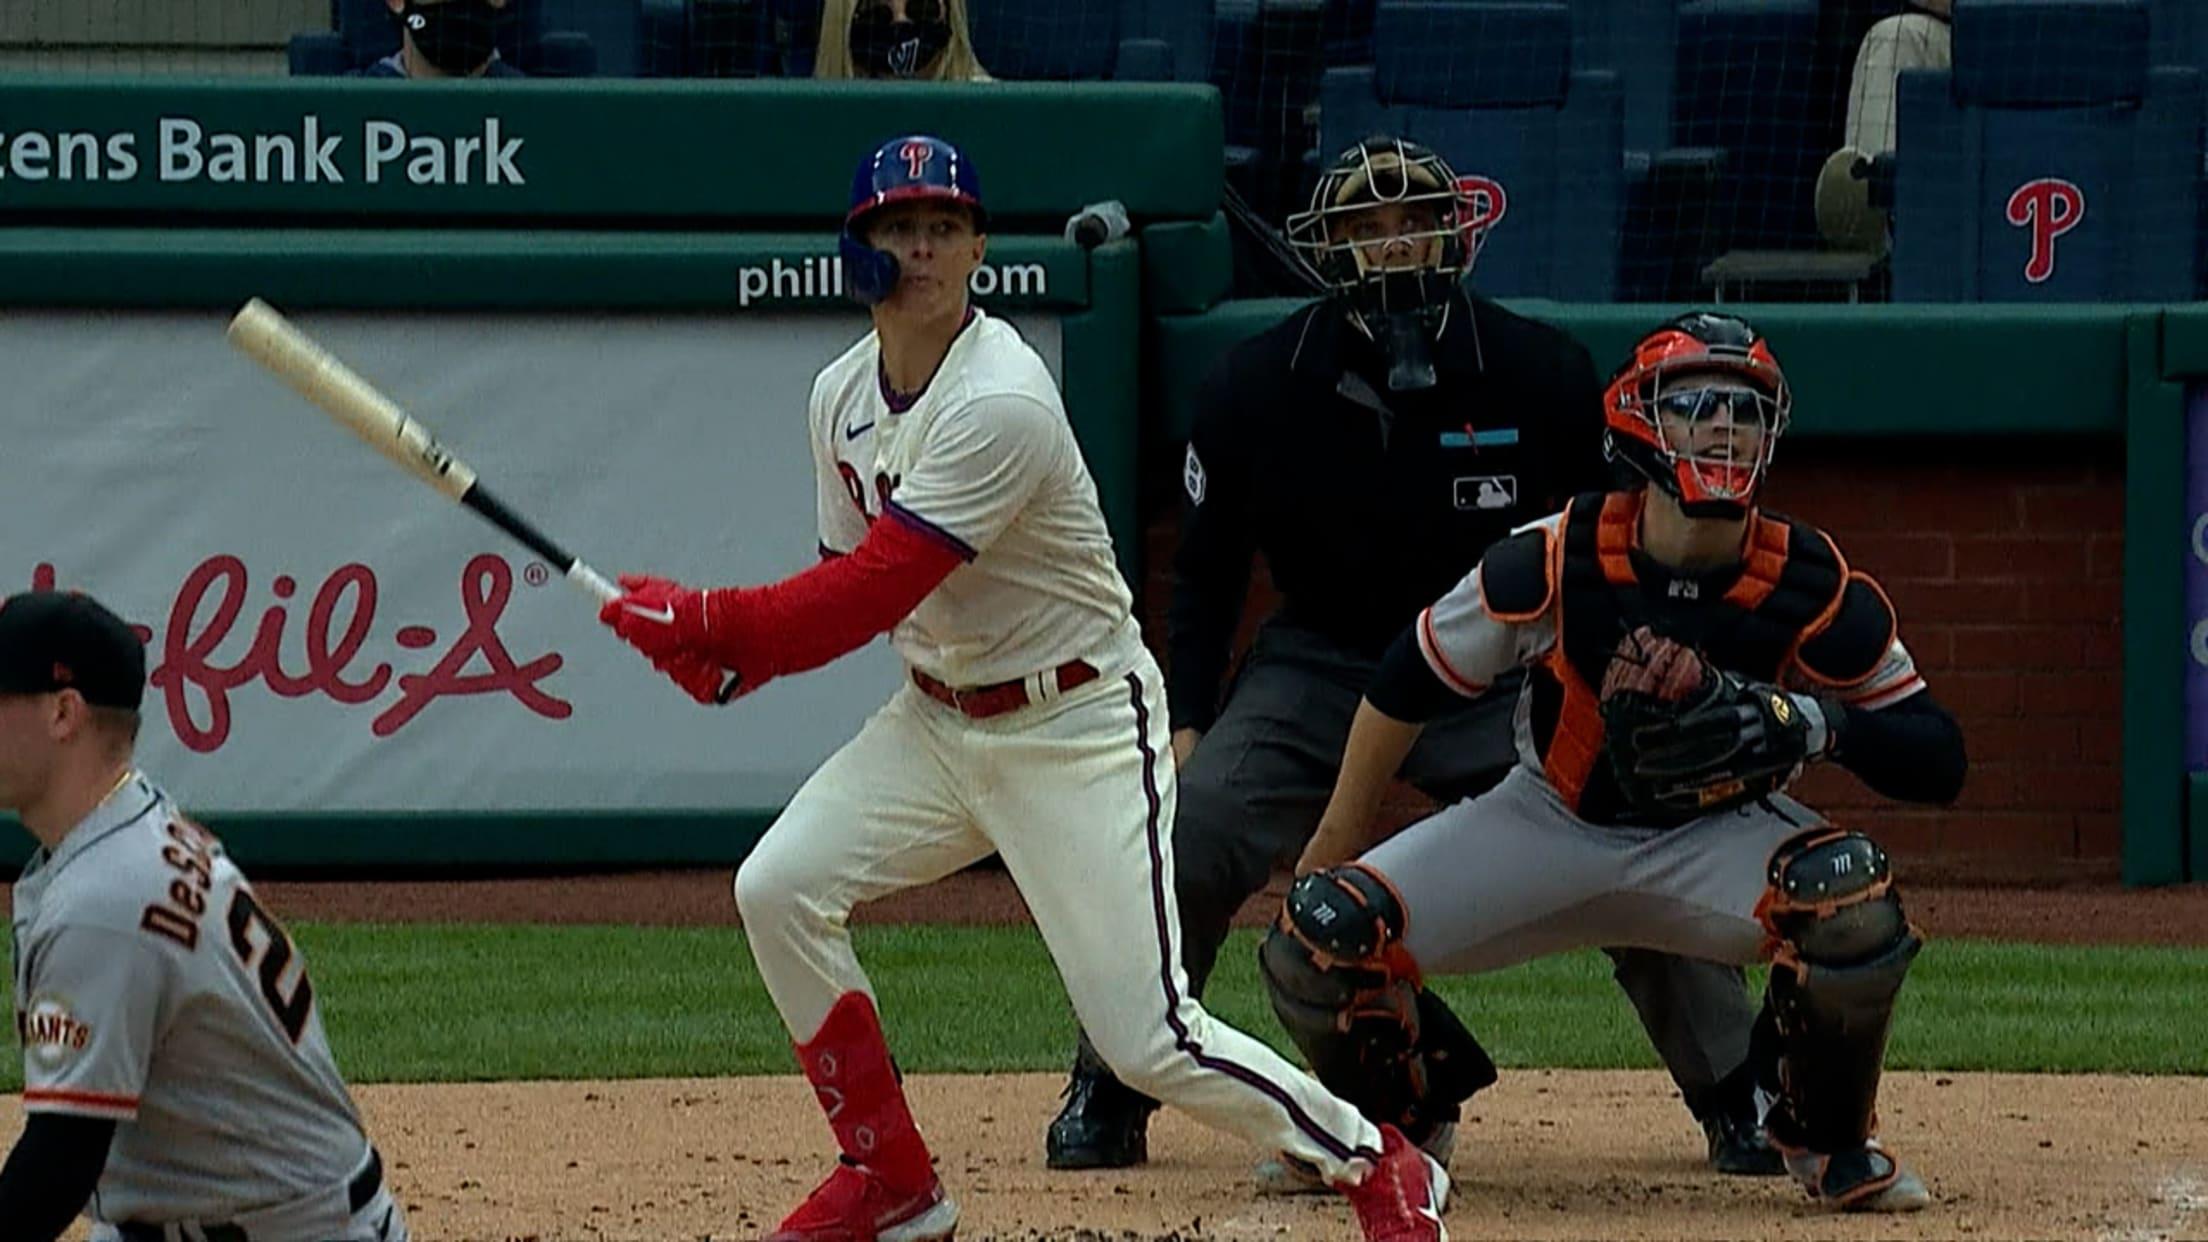 Mickey Moniak's first home run